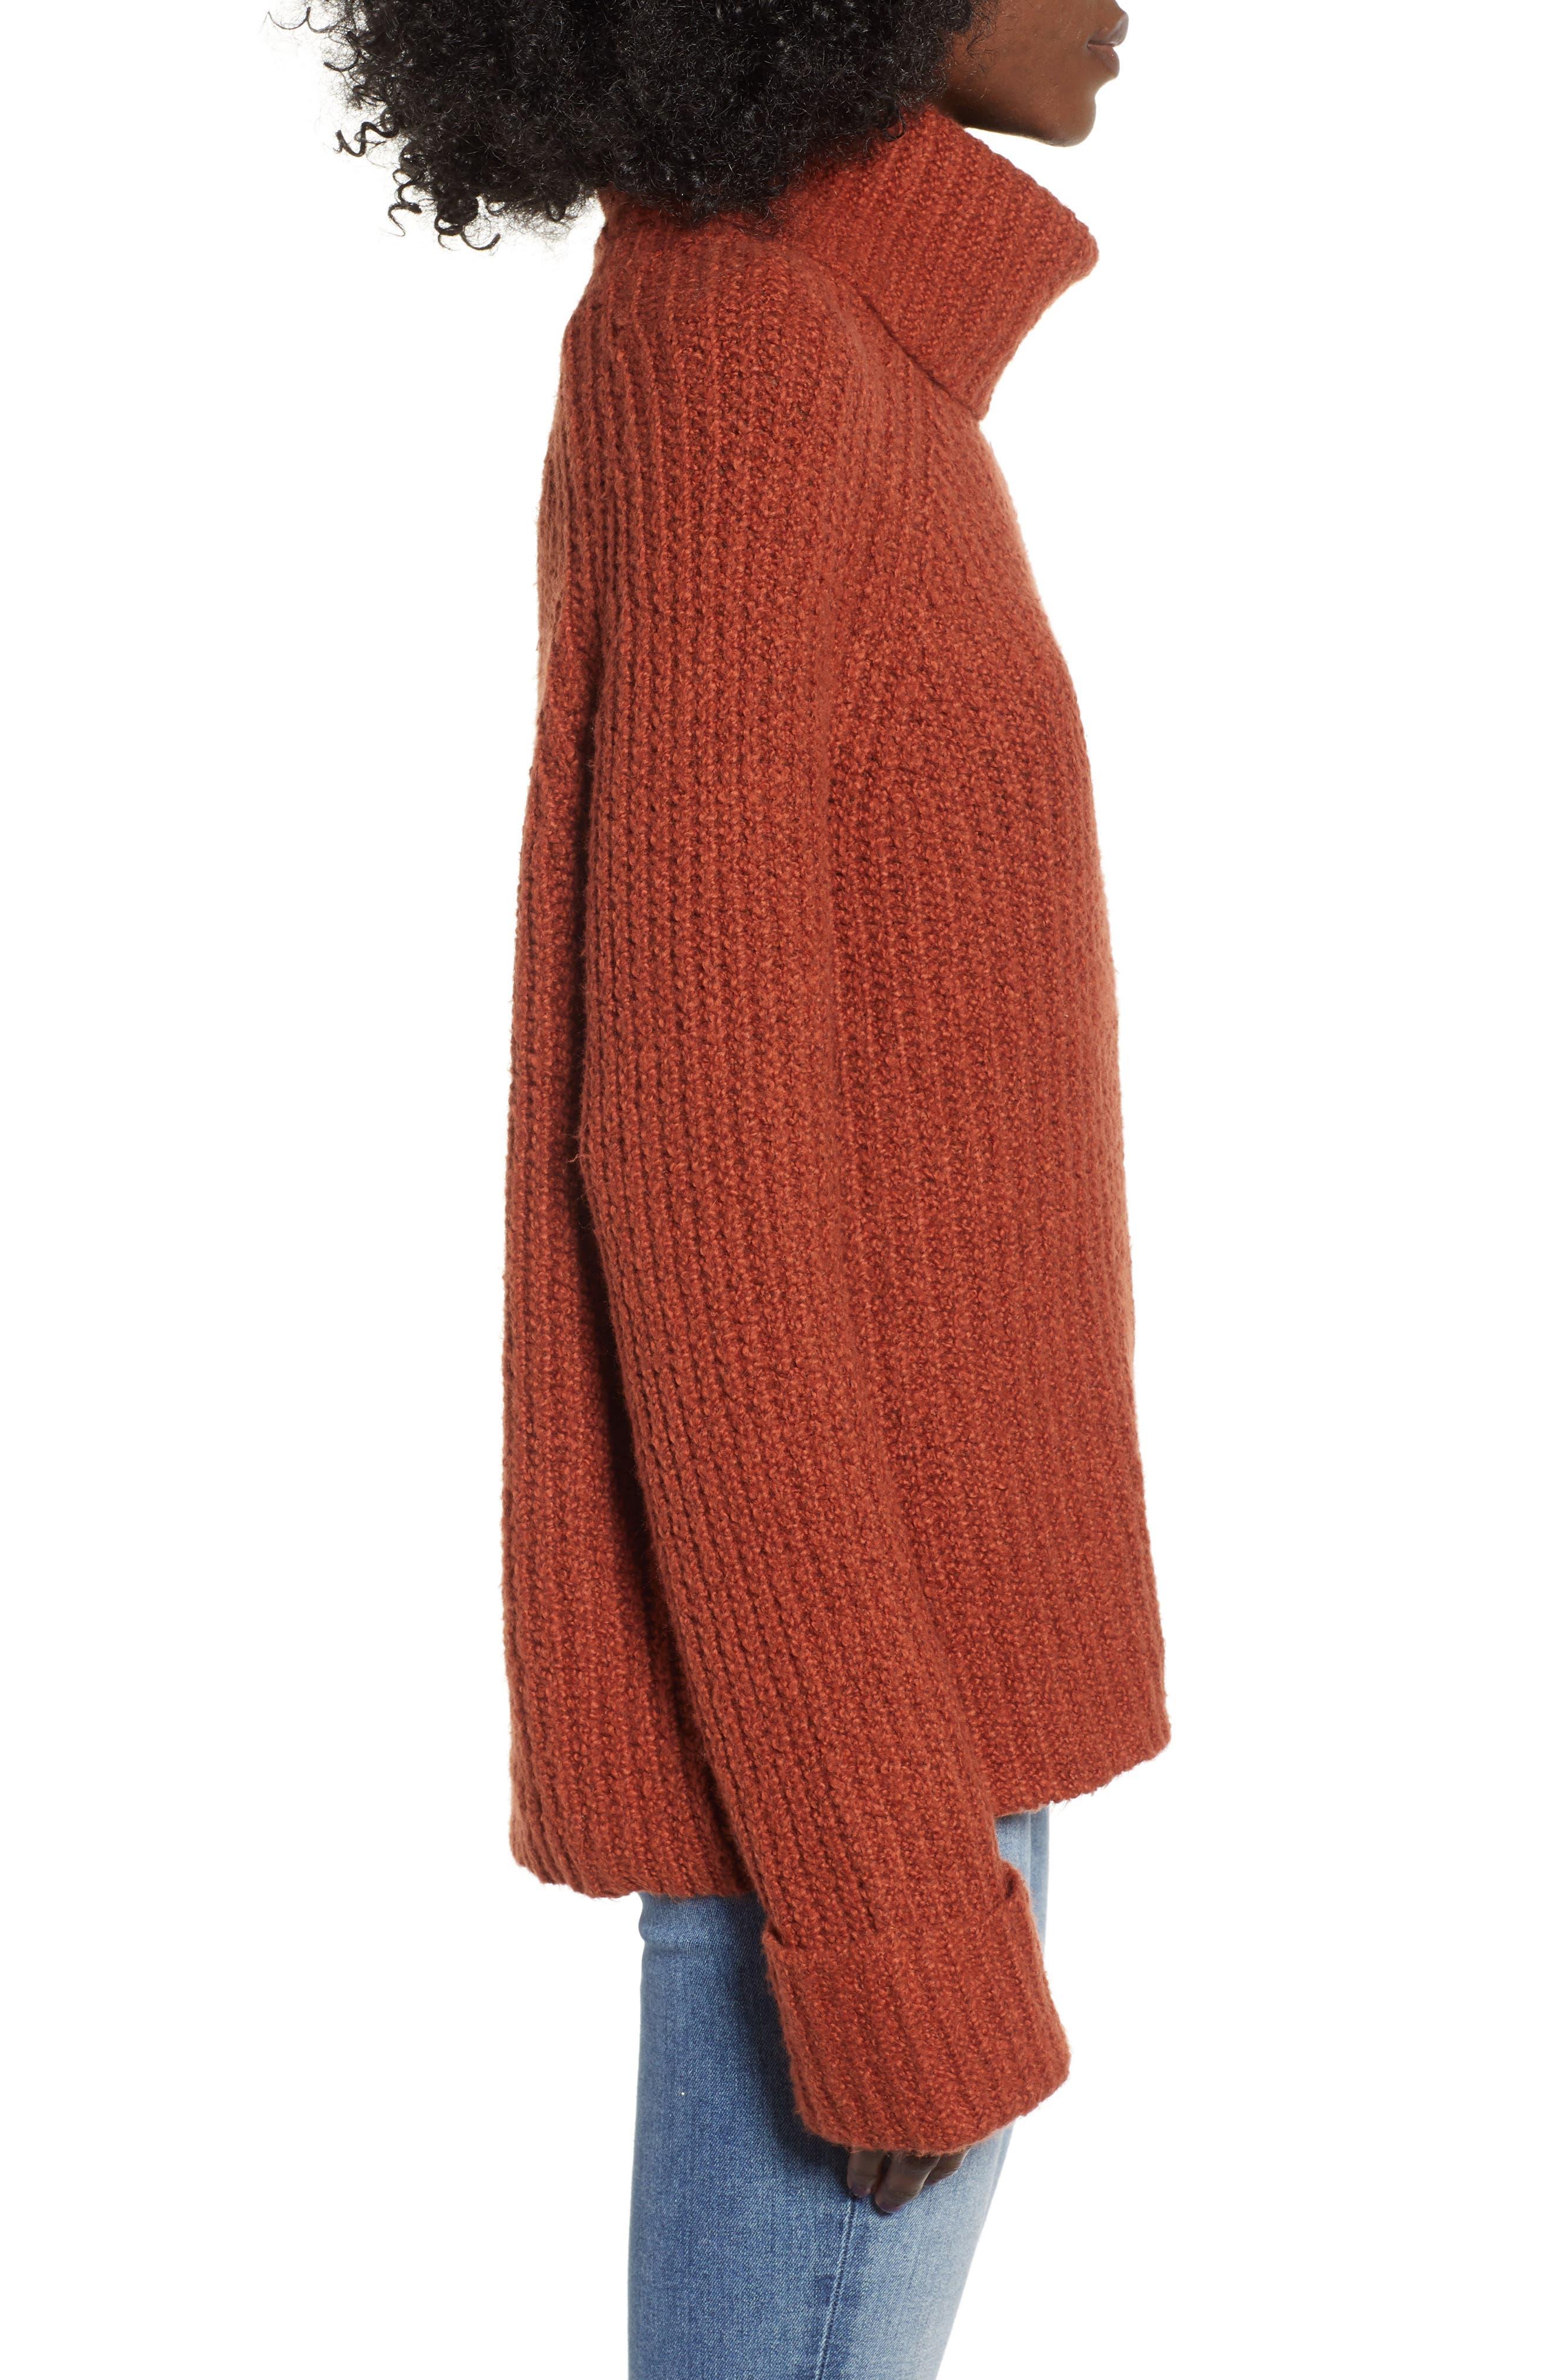 Cozy Turtleneck Sweater,                             Alternate thumbnail 3, color,                             RUST SEQUOIA